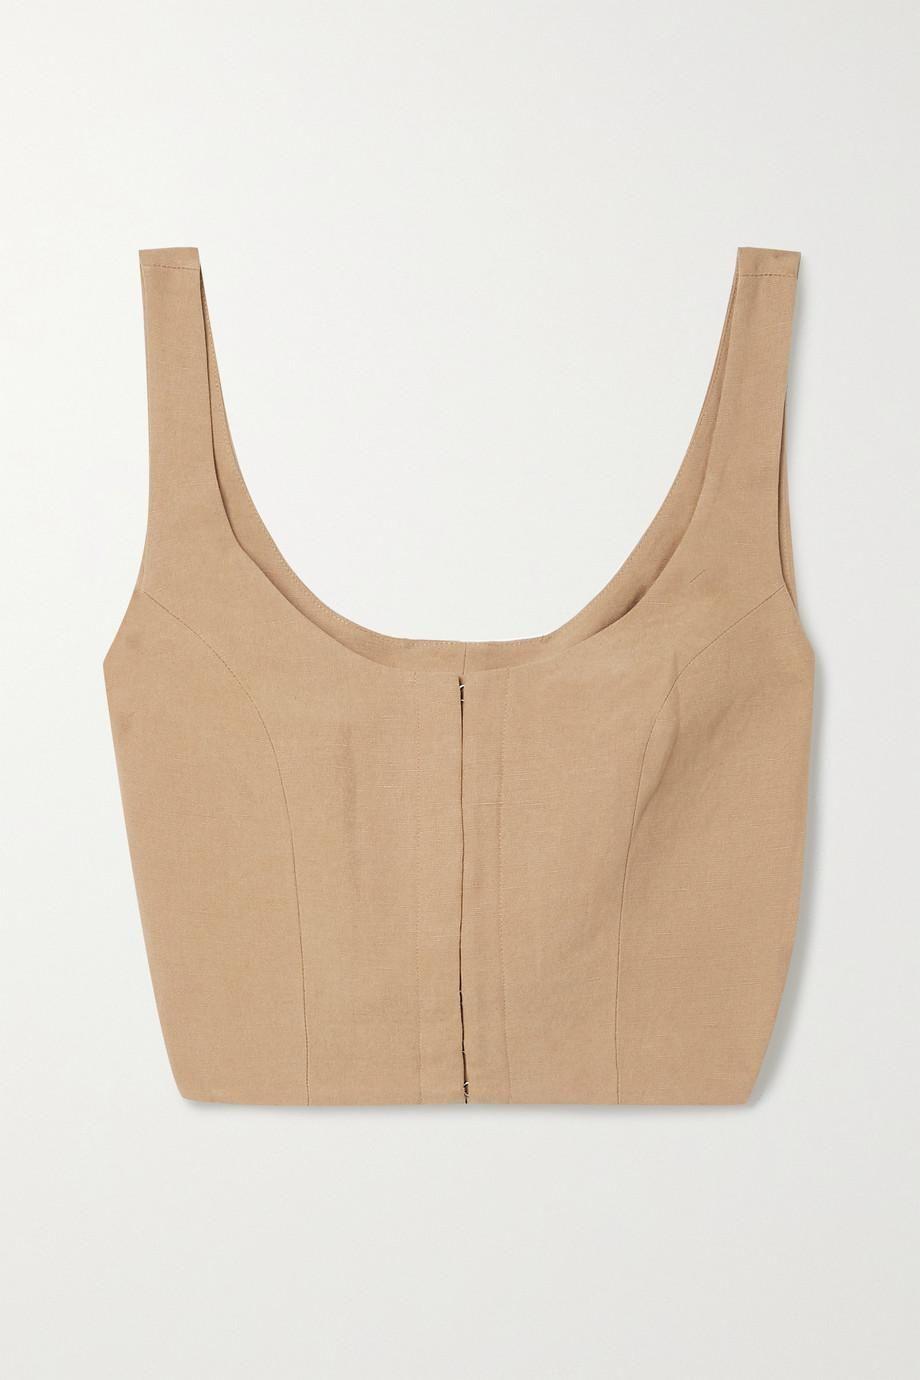 Aisha Cropped TENCEL and Linen-Blend Top